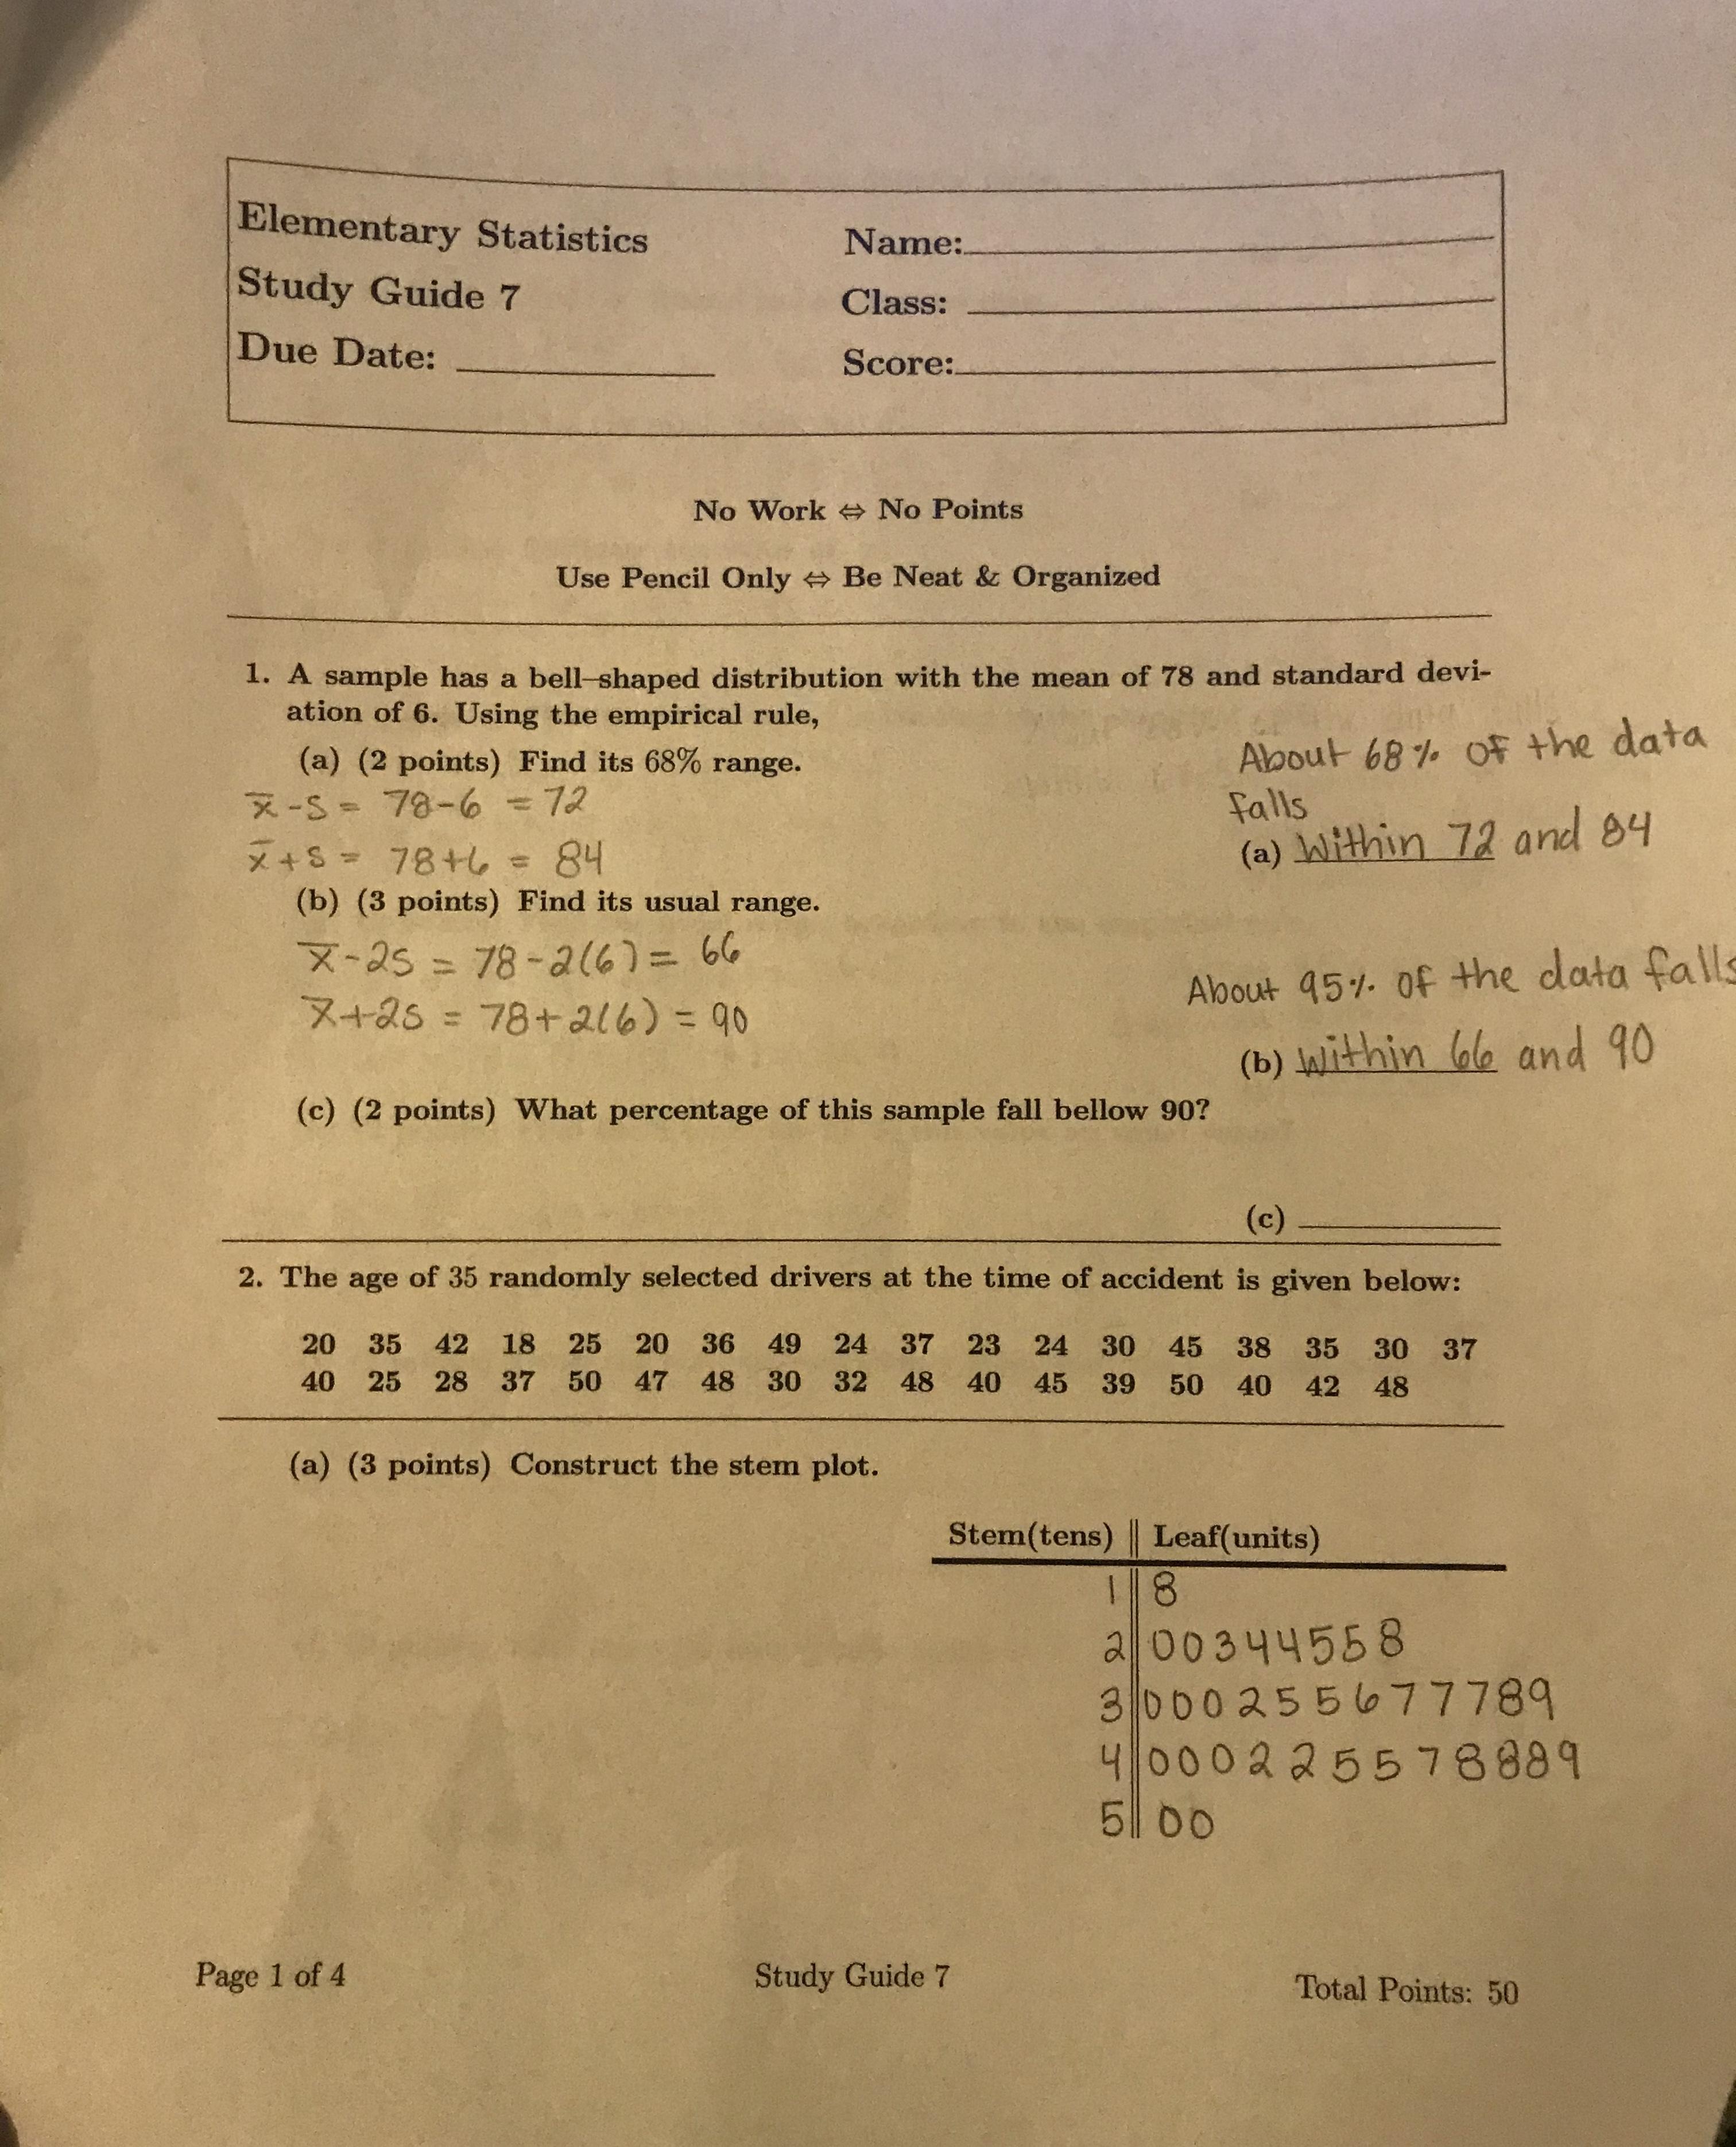 Answered Elementary Statistics Name Study